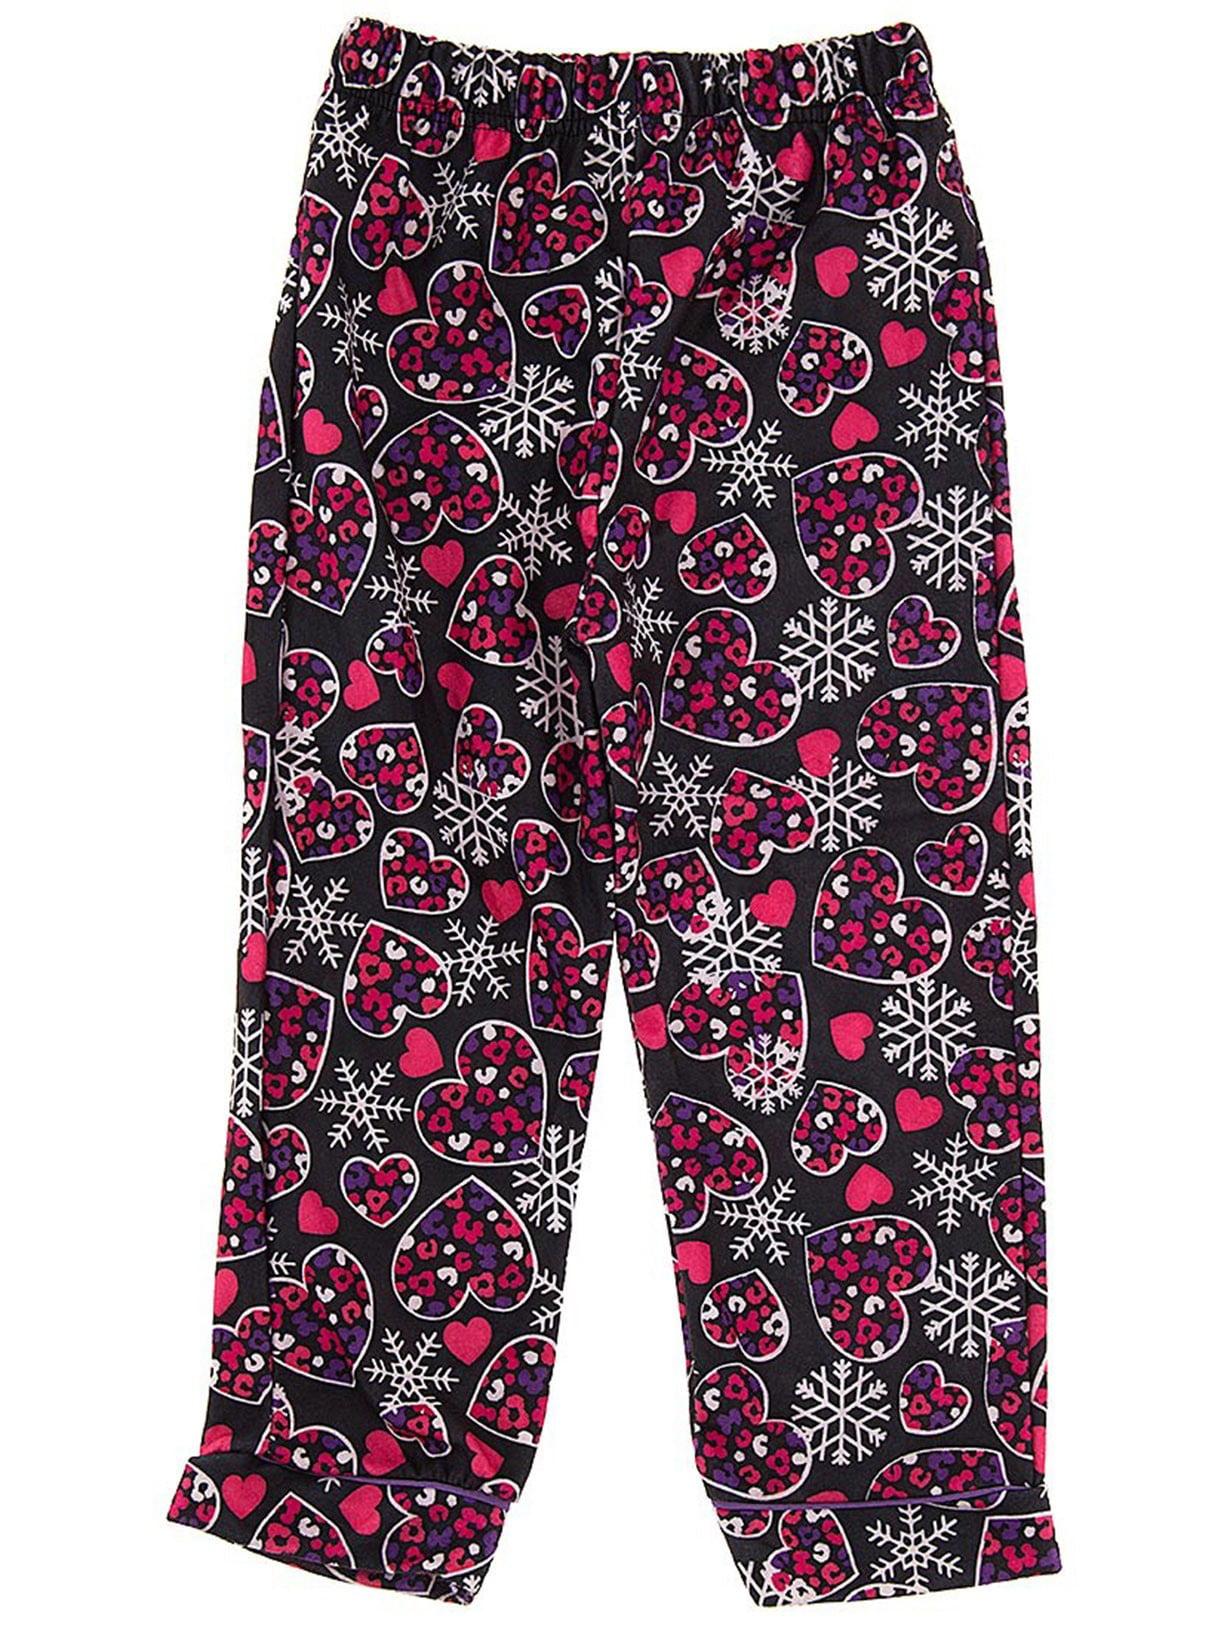 Black Snowflake Pajama Pants for Girls